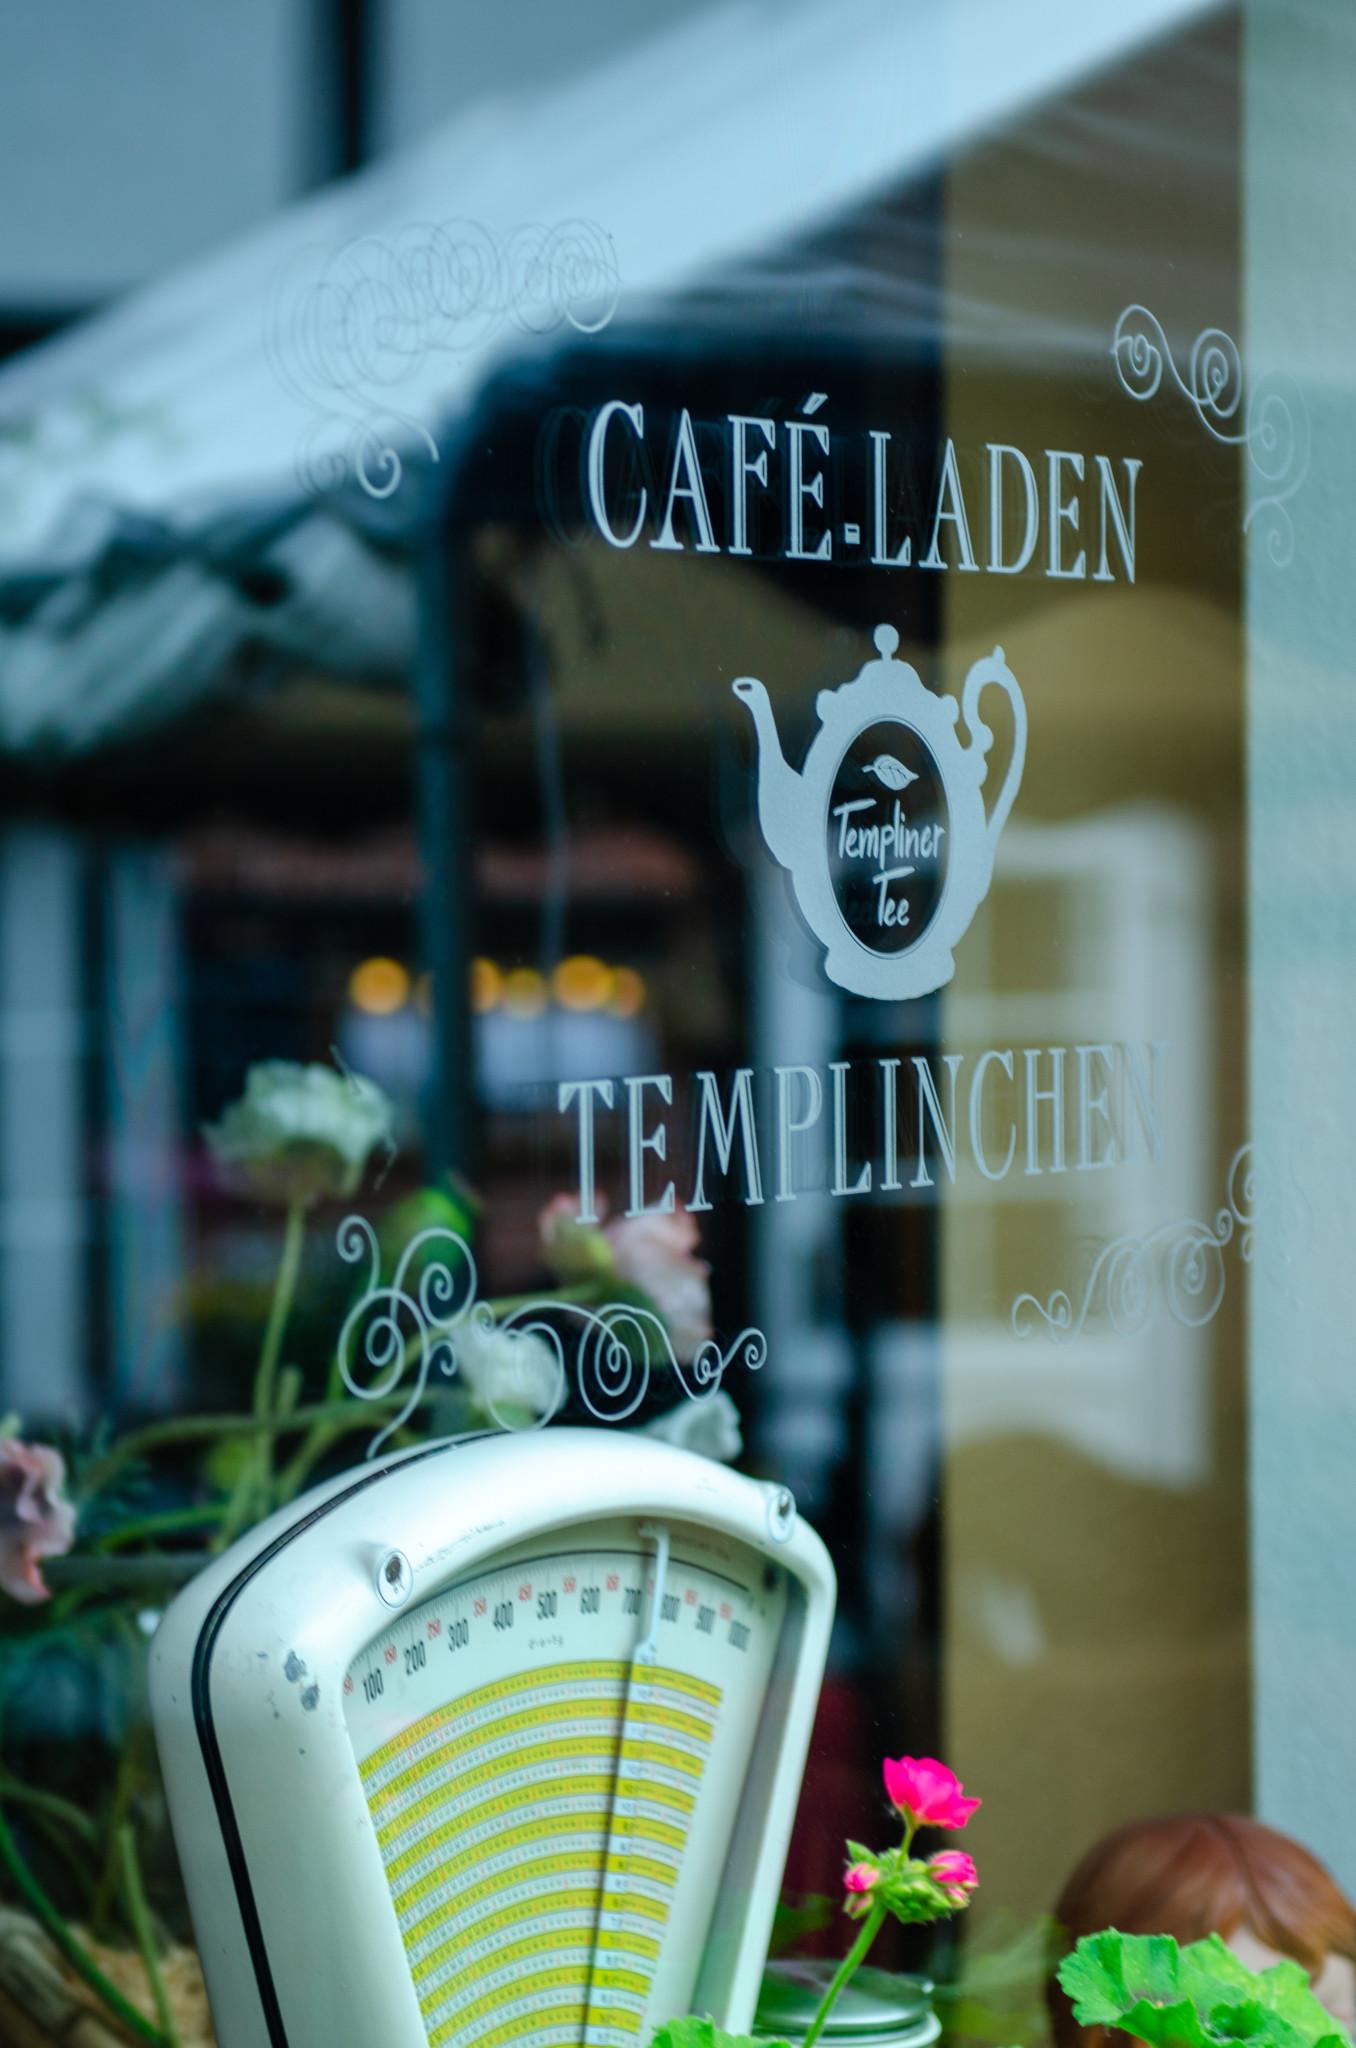 Unser Geheimtipp für Templin ist das Café Templino